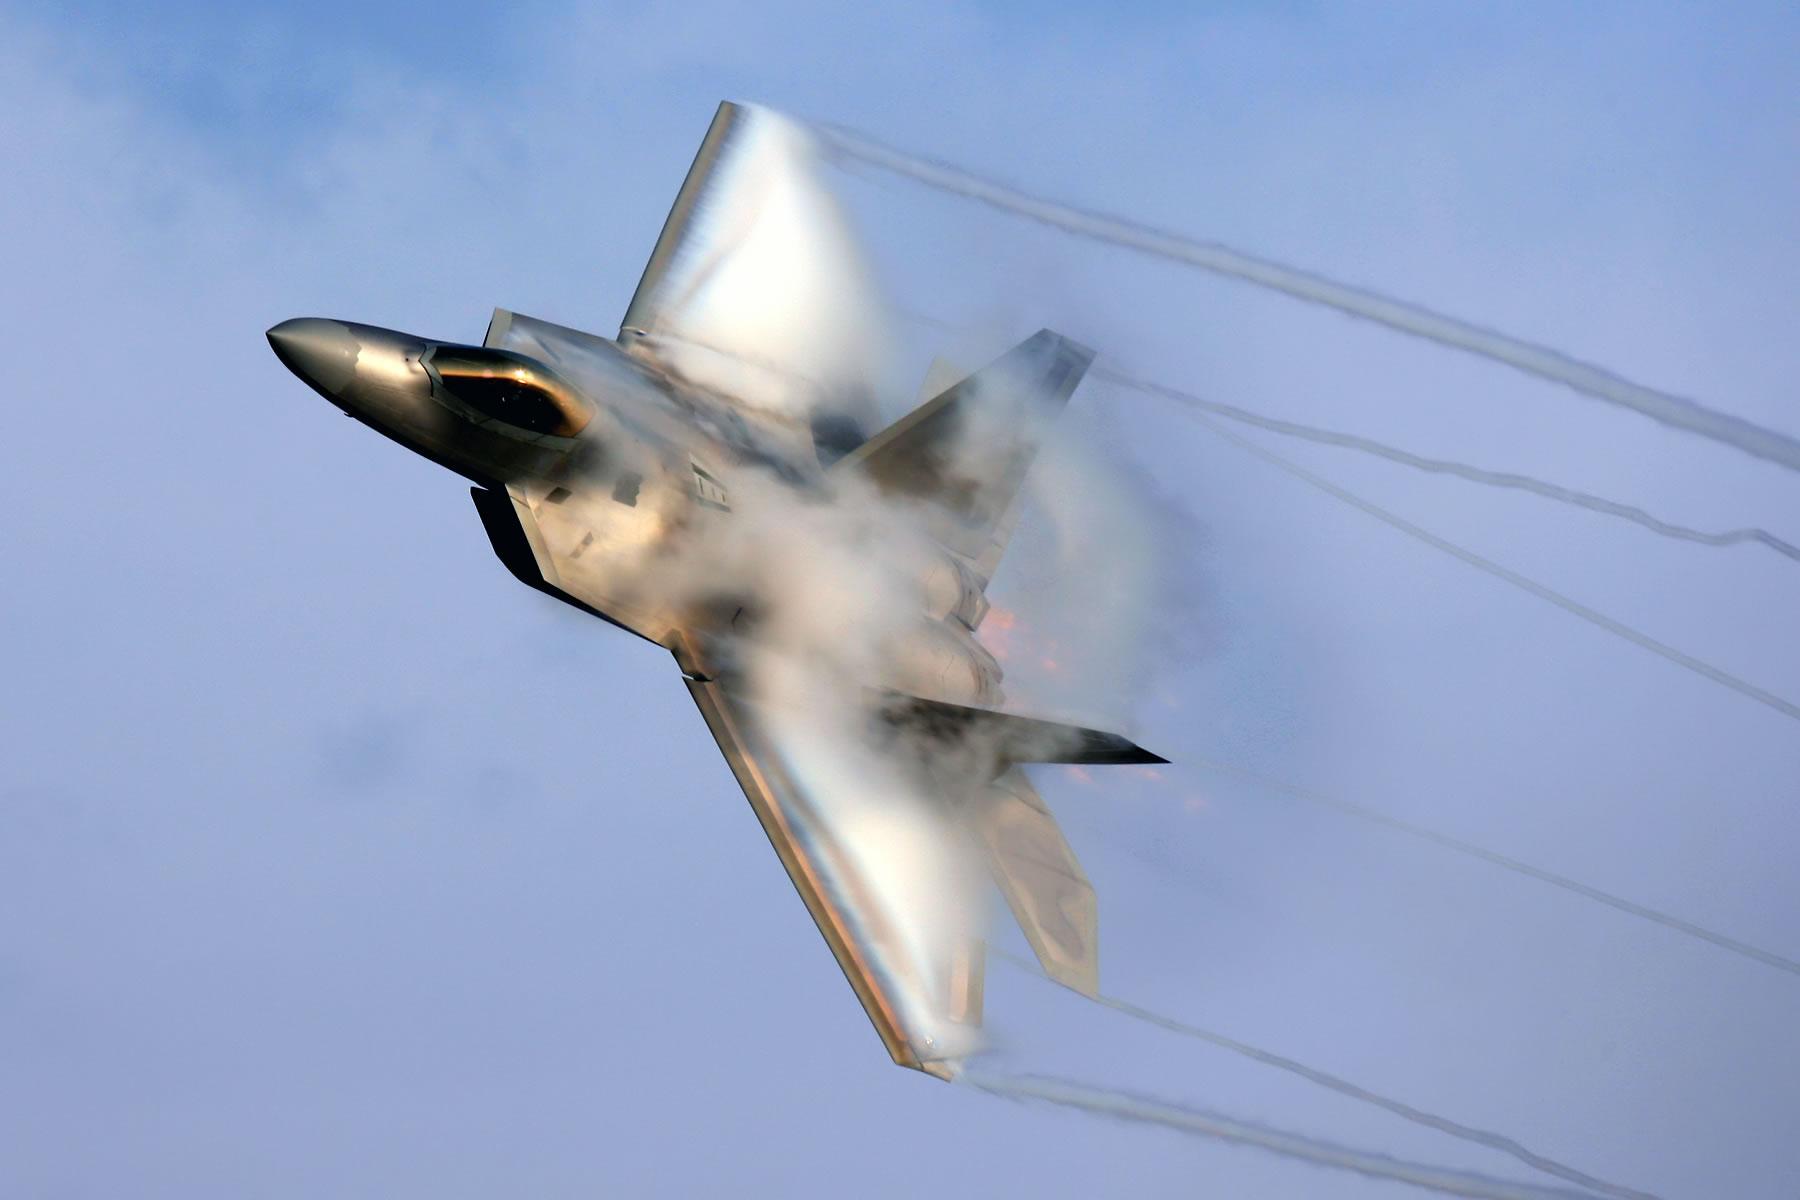 F22 Raptor With Vapor F 22 Raptor Supersonic 1707074 Hd